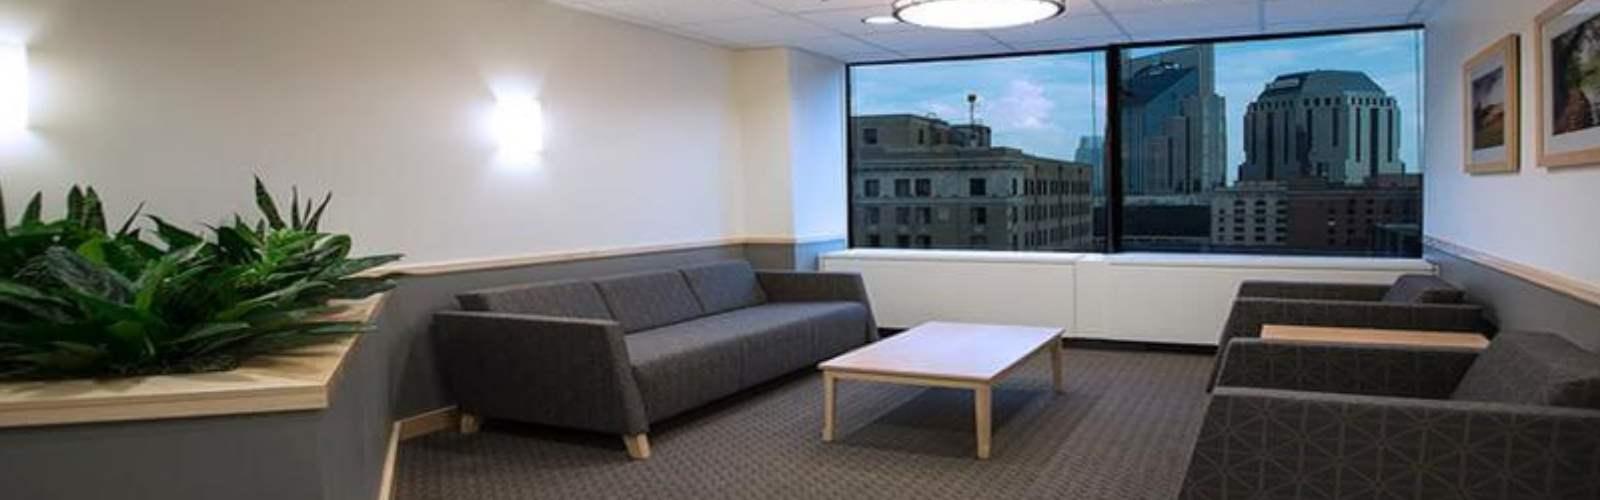 Slide of location interior.